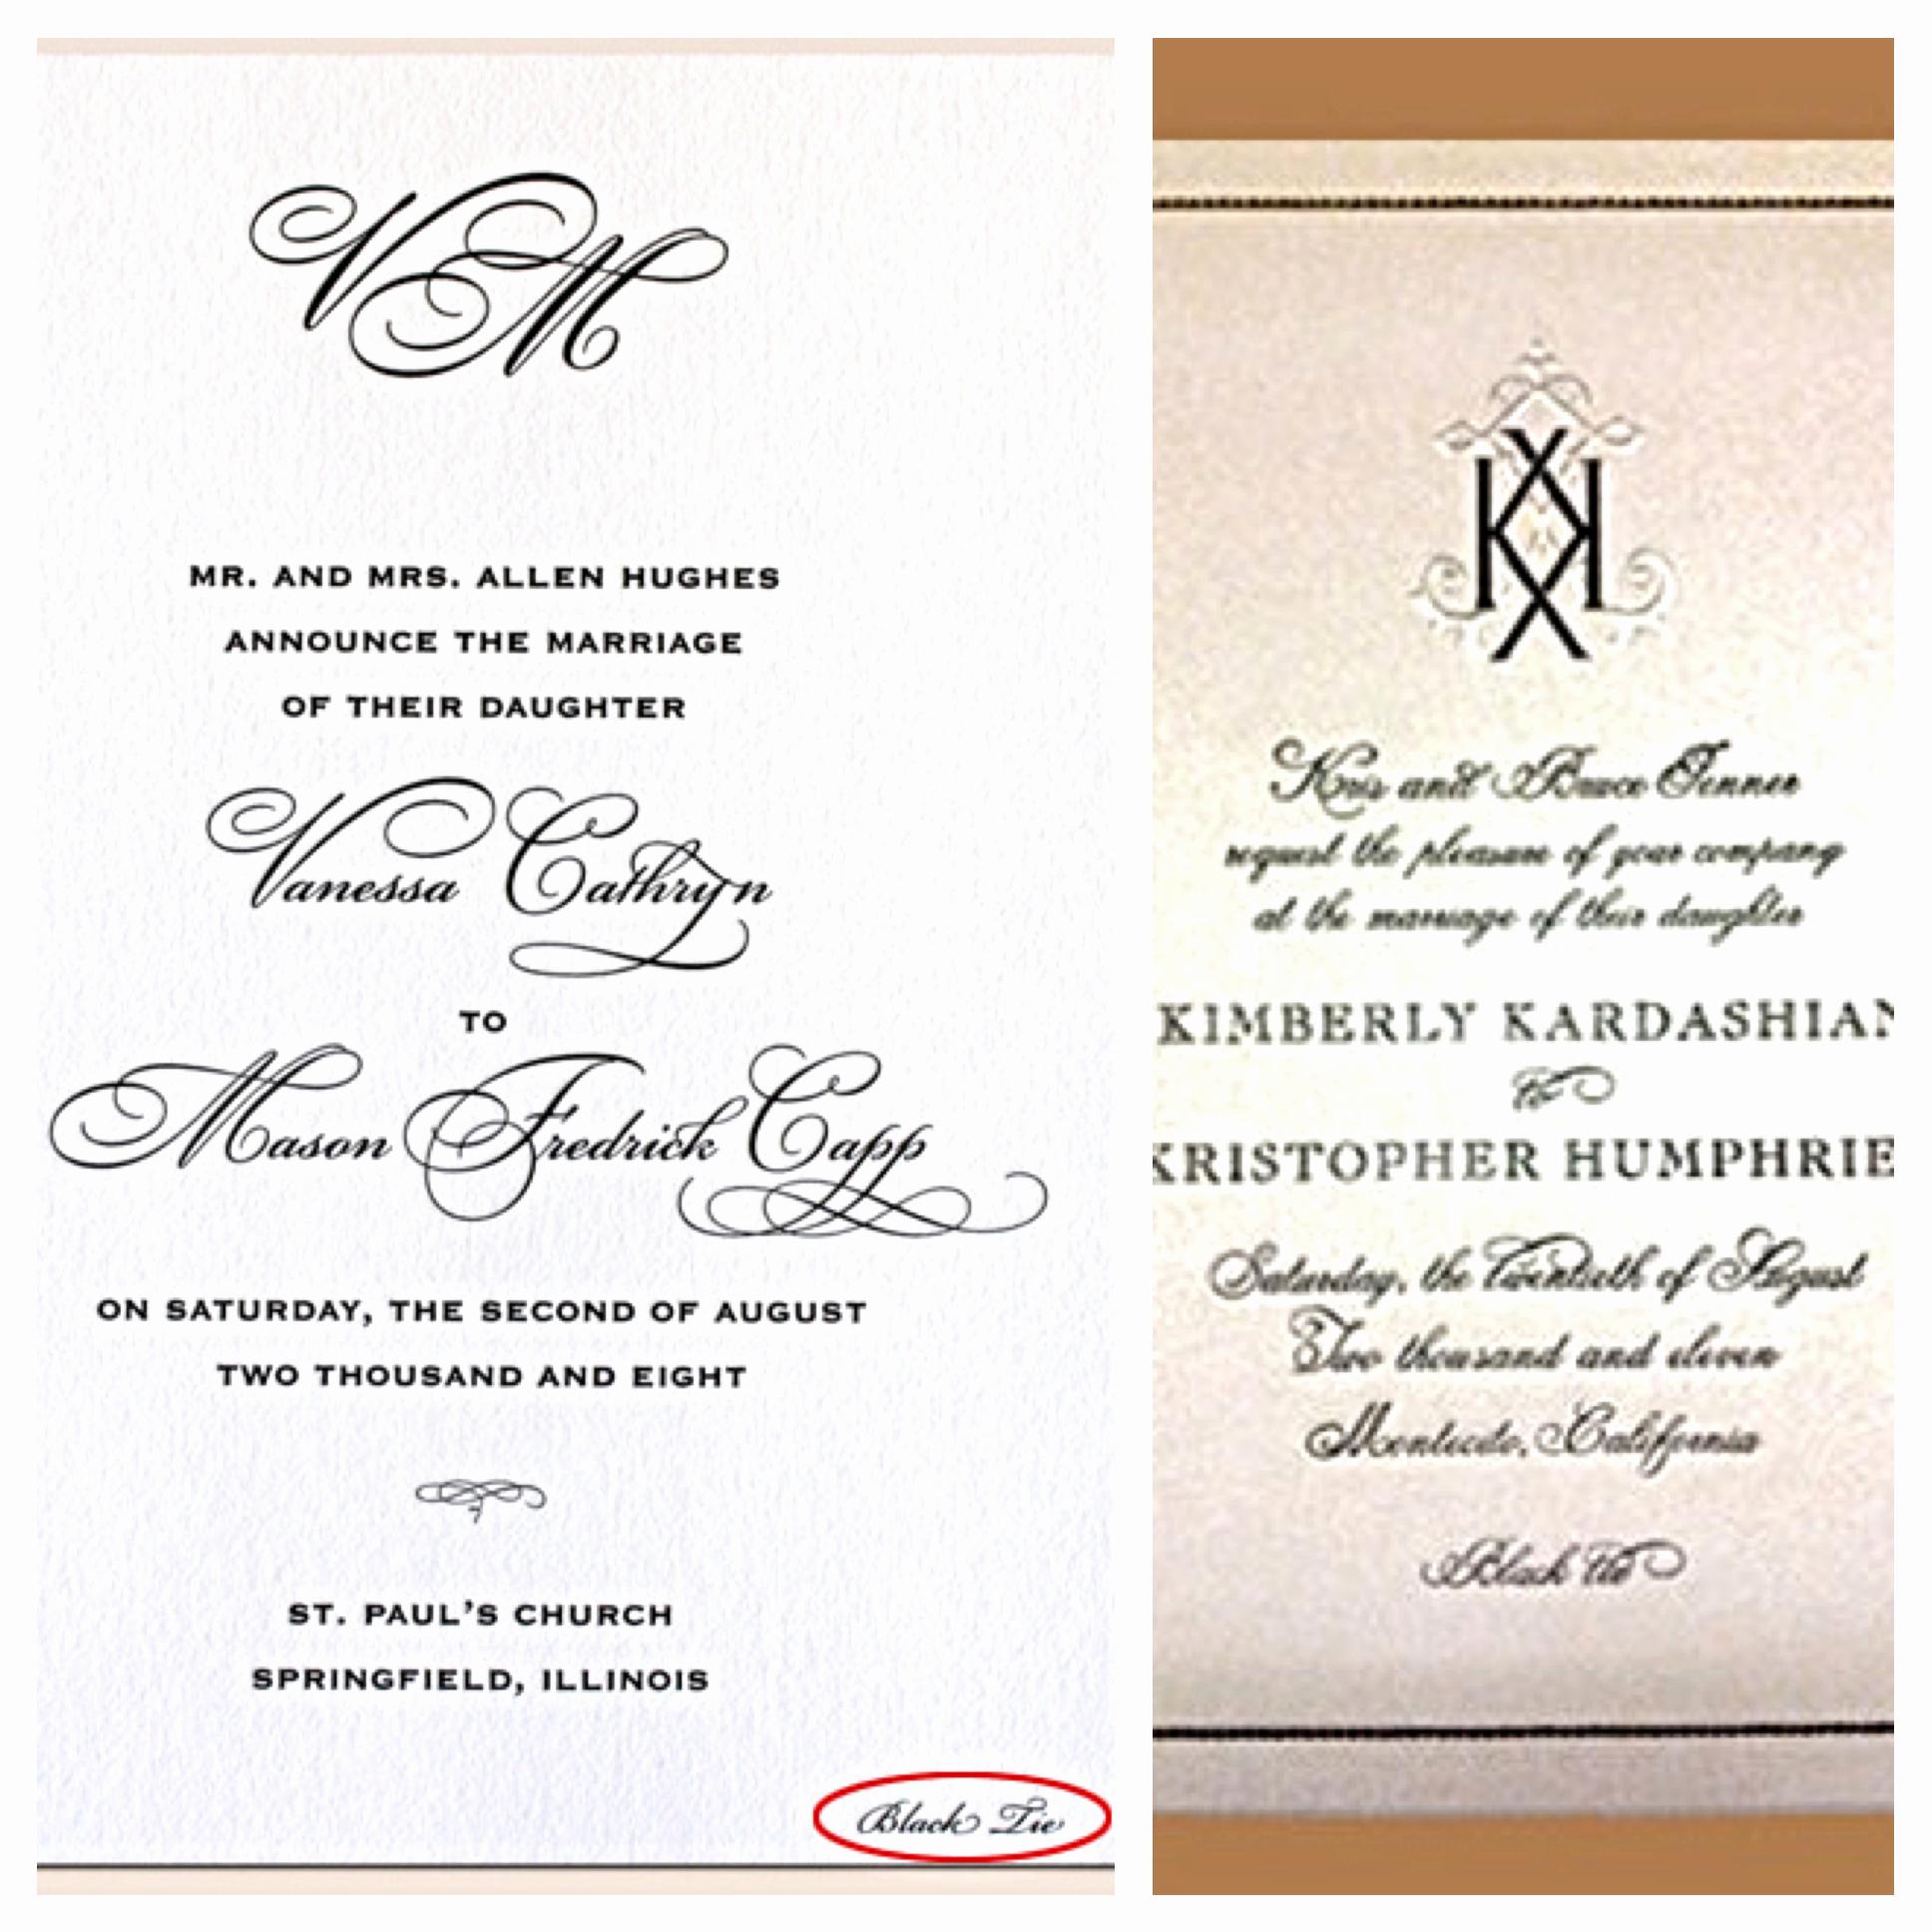 Catholic Wedding Invitation Wordings Luxury Wedding Invitation Adorable Wedding Invitation Etiquette